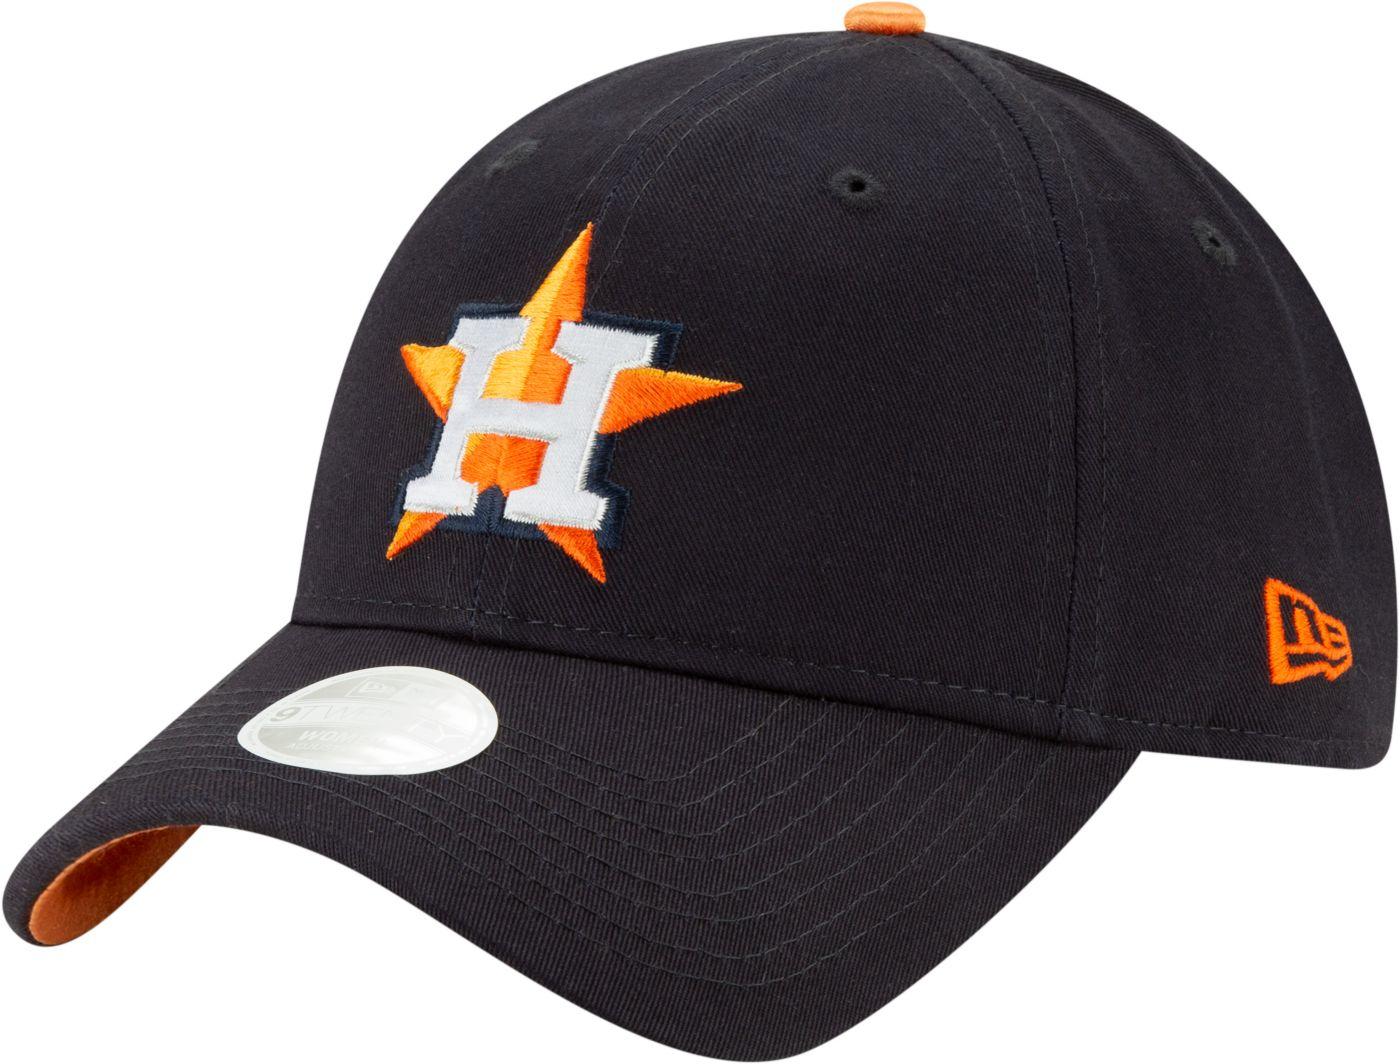 New Era Women's Houston Astros 9Twenty Bow Back Adjustable Hat